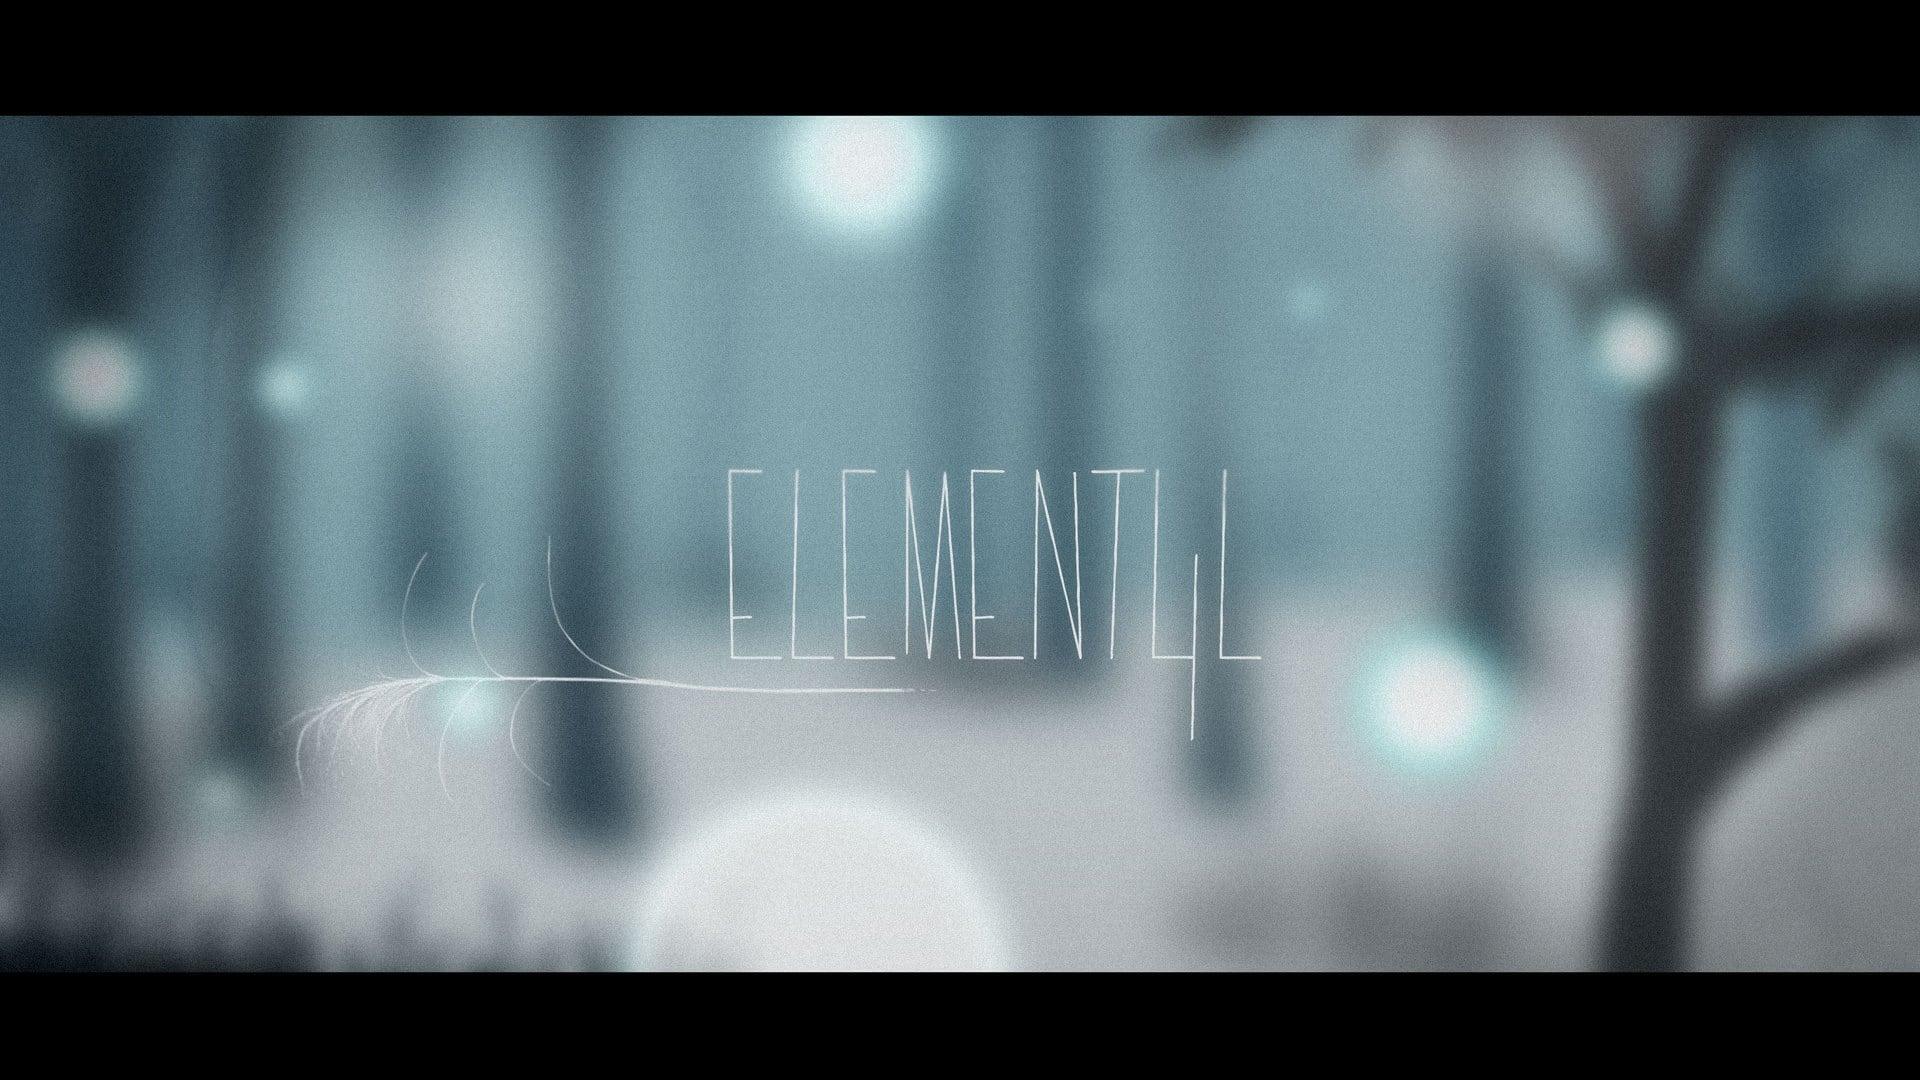 ELEMENT4L